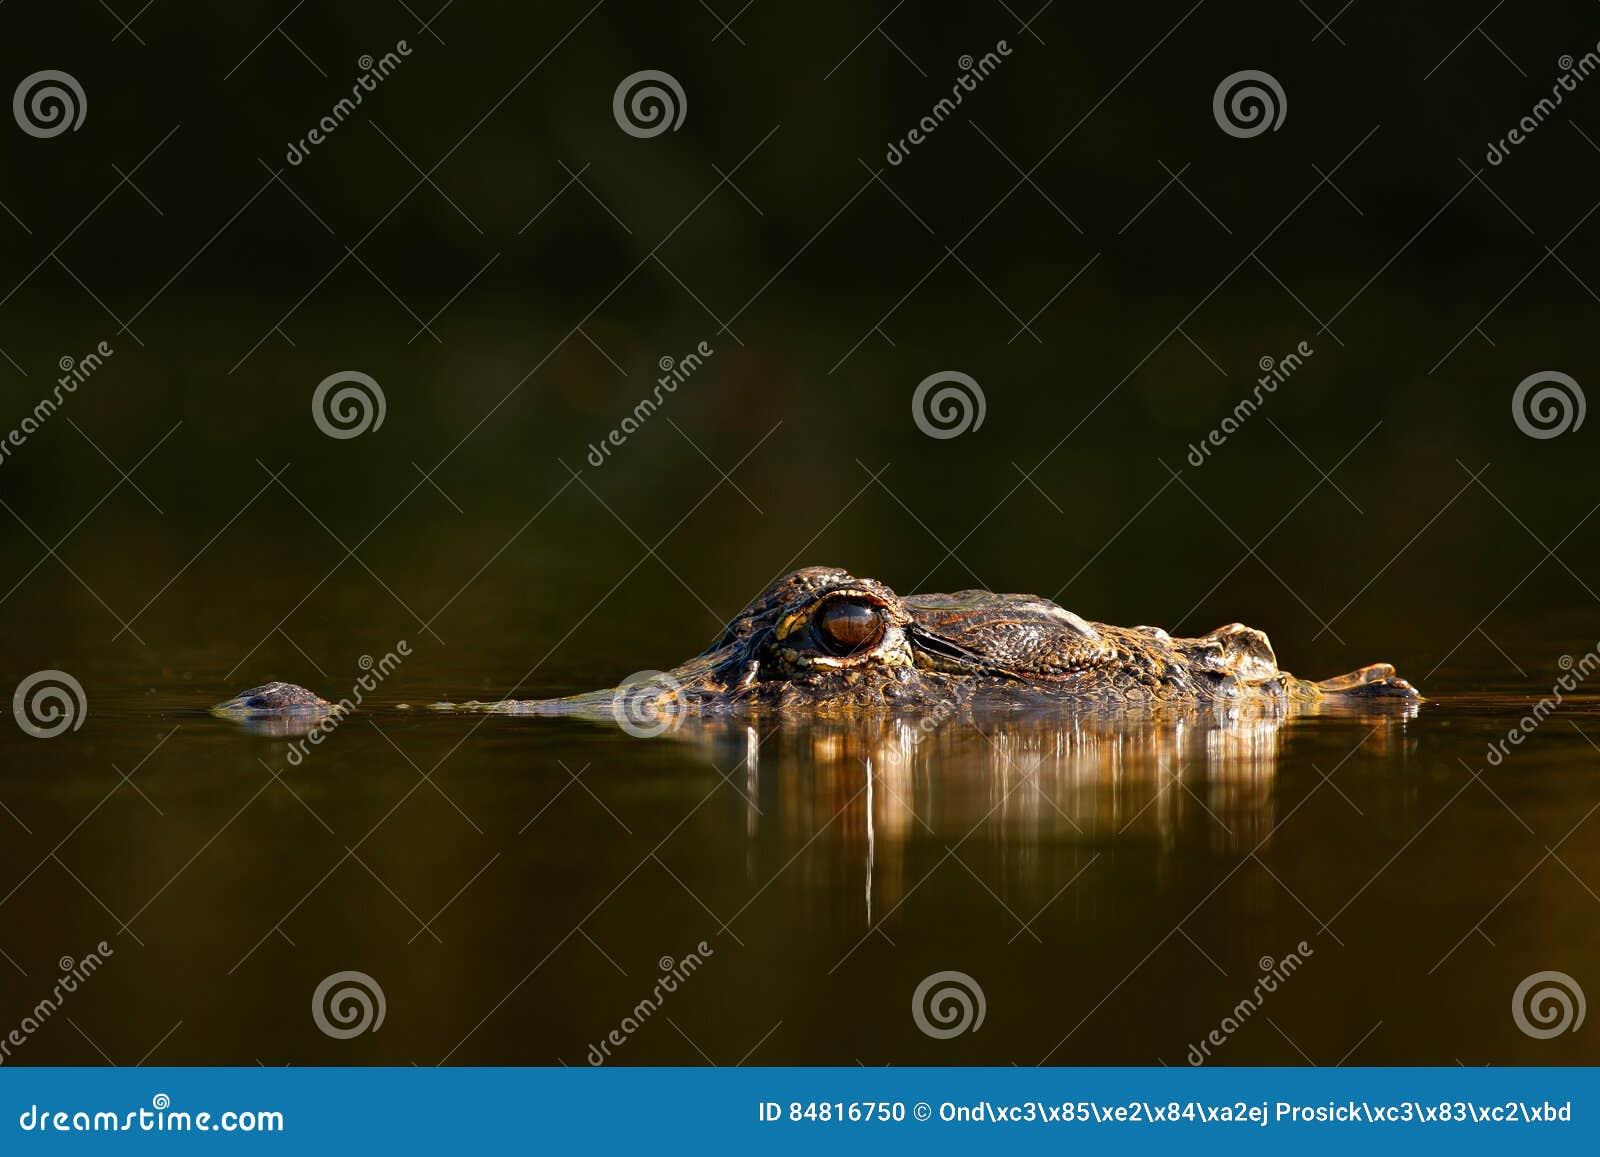 Amerikaanse Krokodille, Krokodillemississippiensis, NP Everglades, Florida, de V.S. Nog waterspiegel met krokodil Donker water me